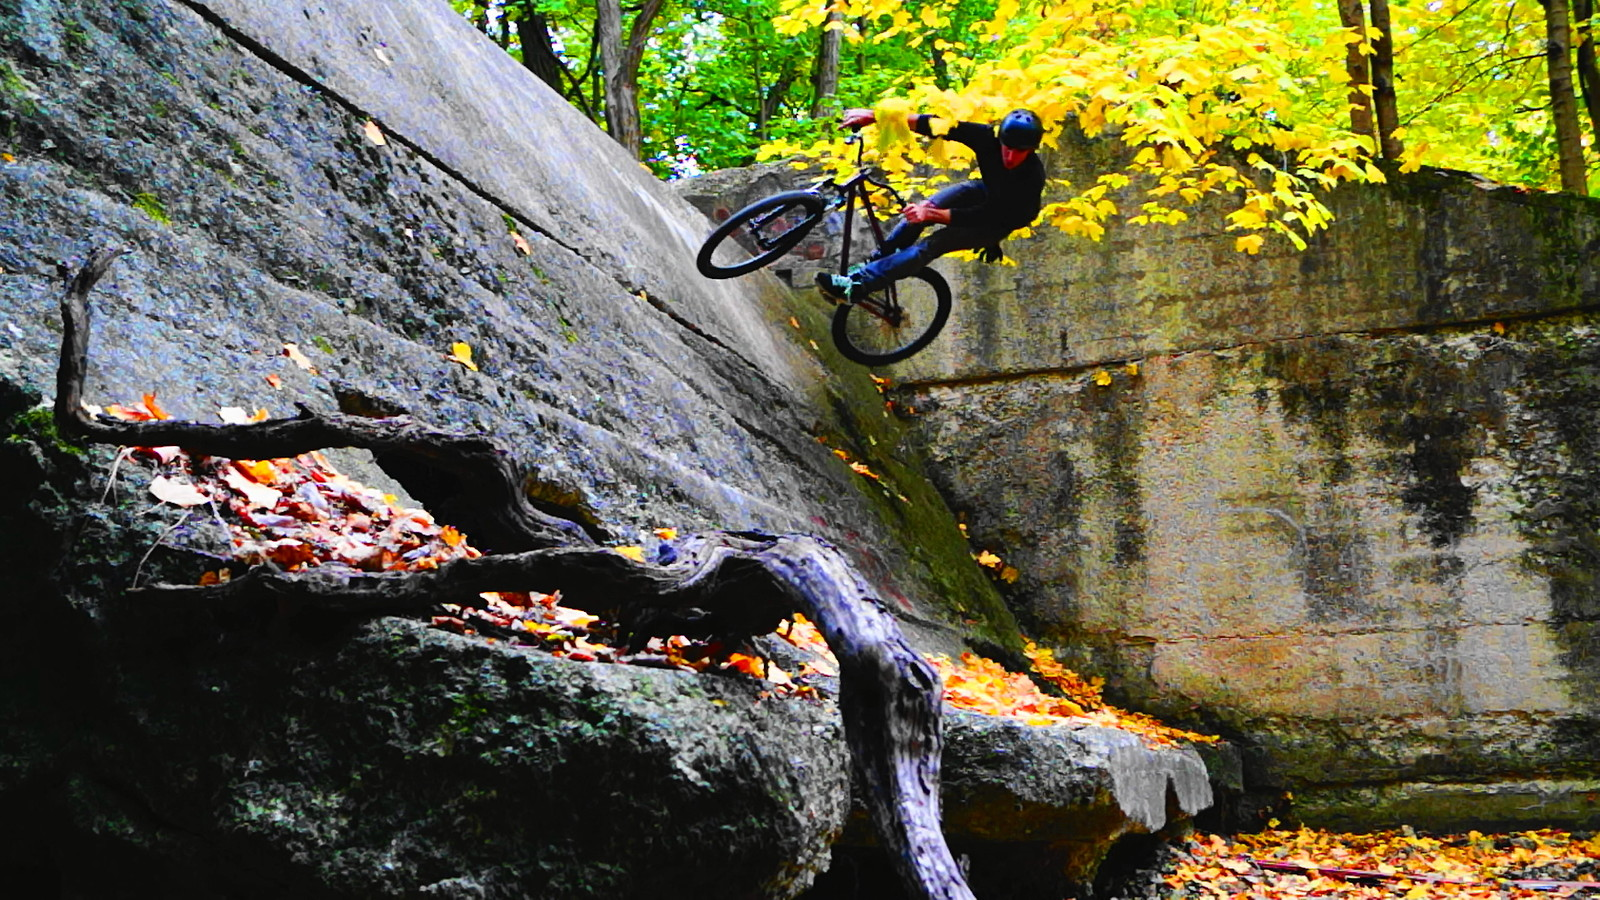 Old dam quarter - slager - Mountain Biking Pictures - Vital MTB